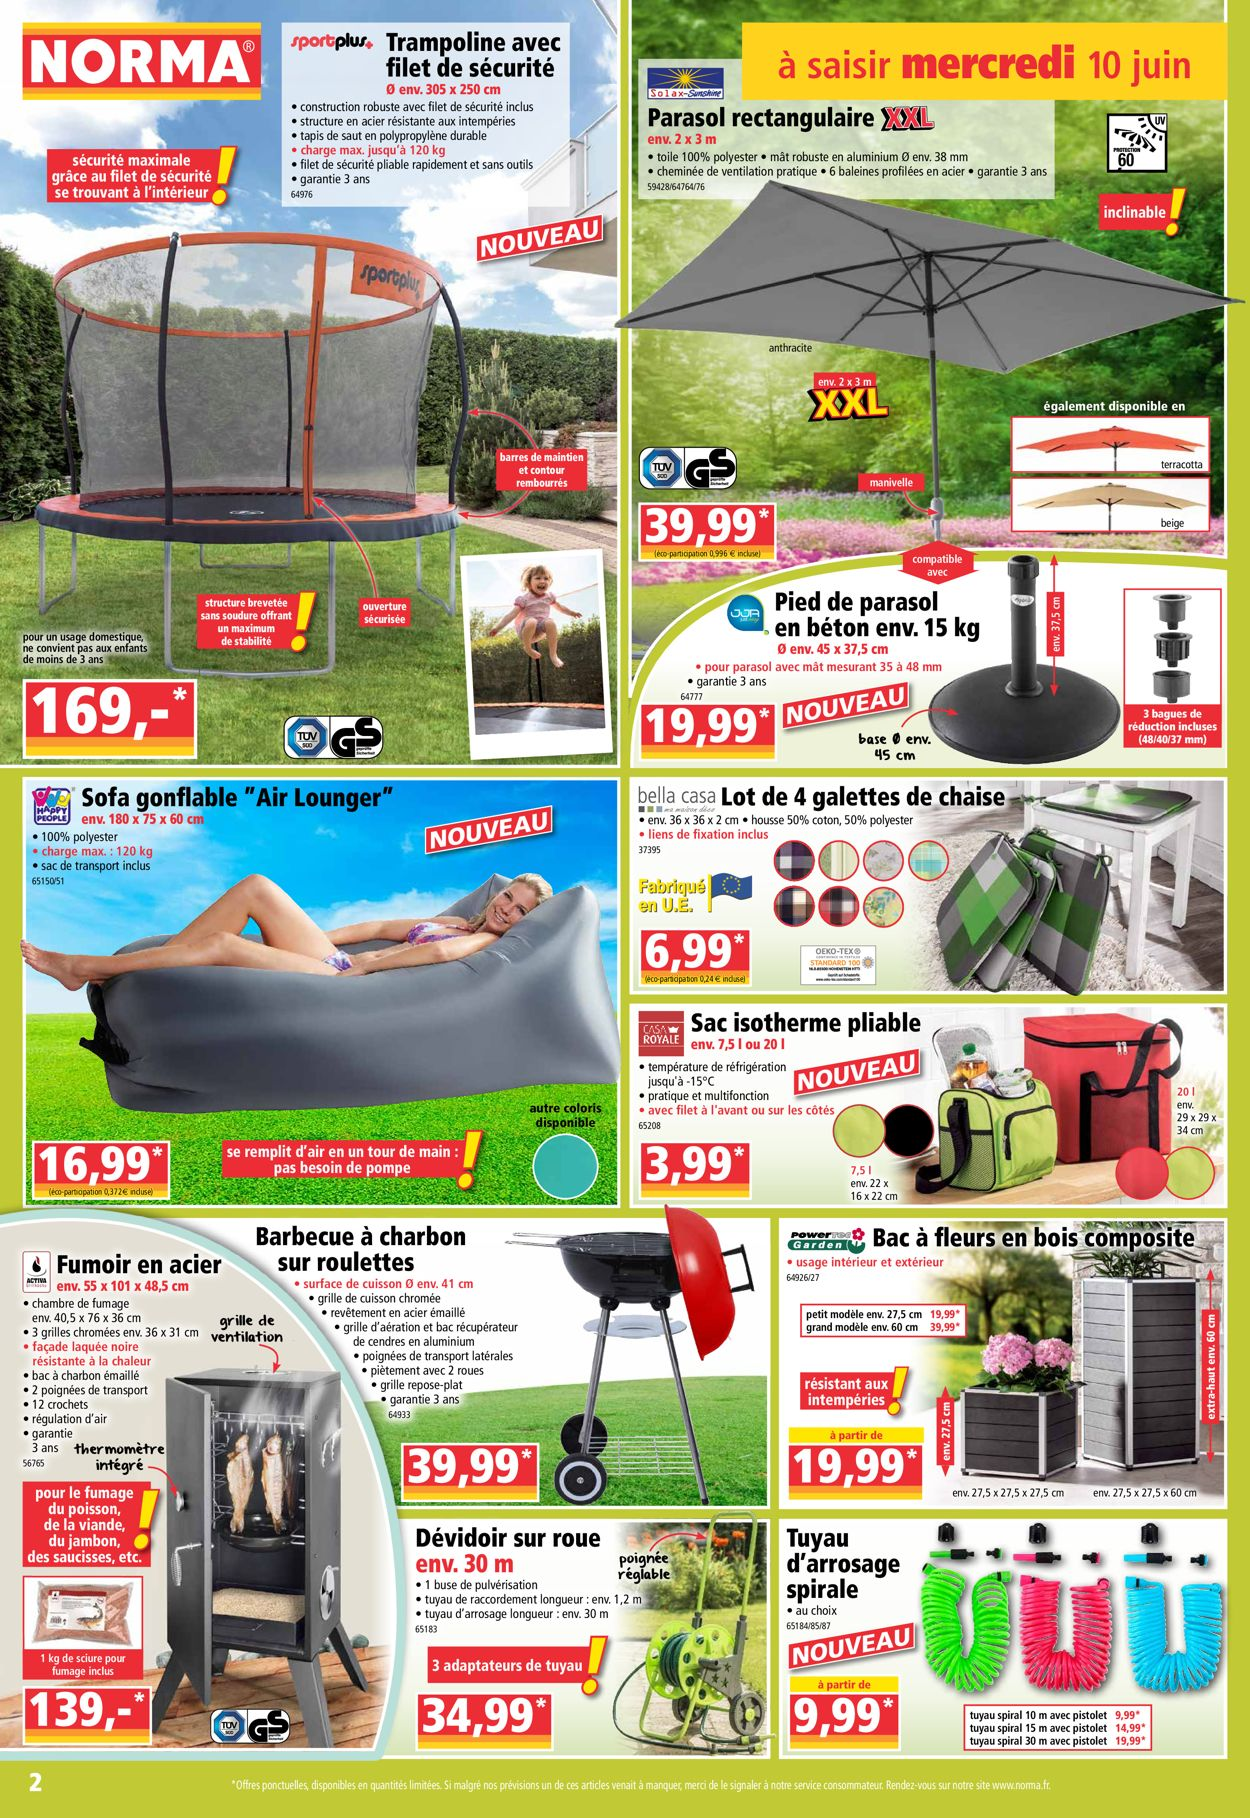 Norma Catalogue - 10.06-16.06.2020 (Page 2)